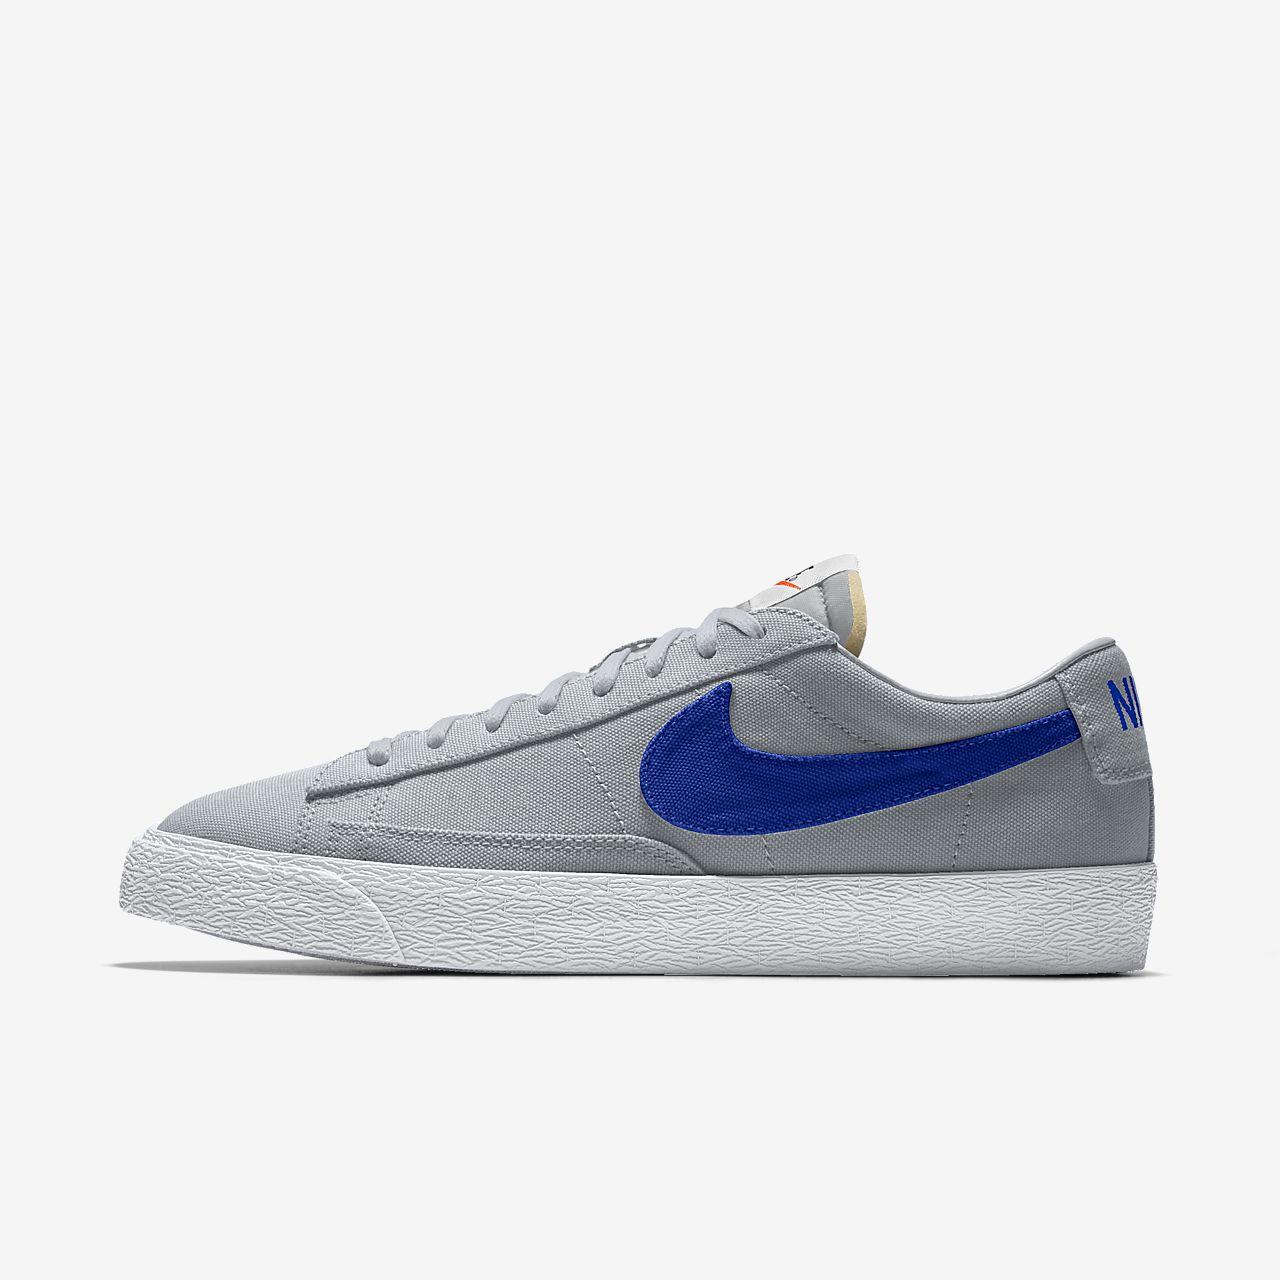 Nike Blazer Low By You personalisierbarer Herrenschuh